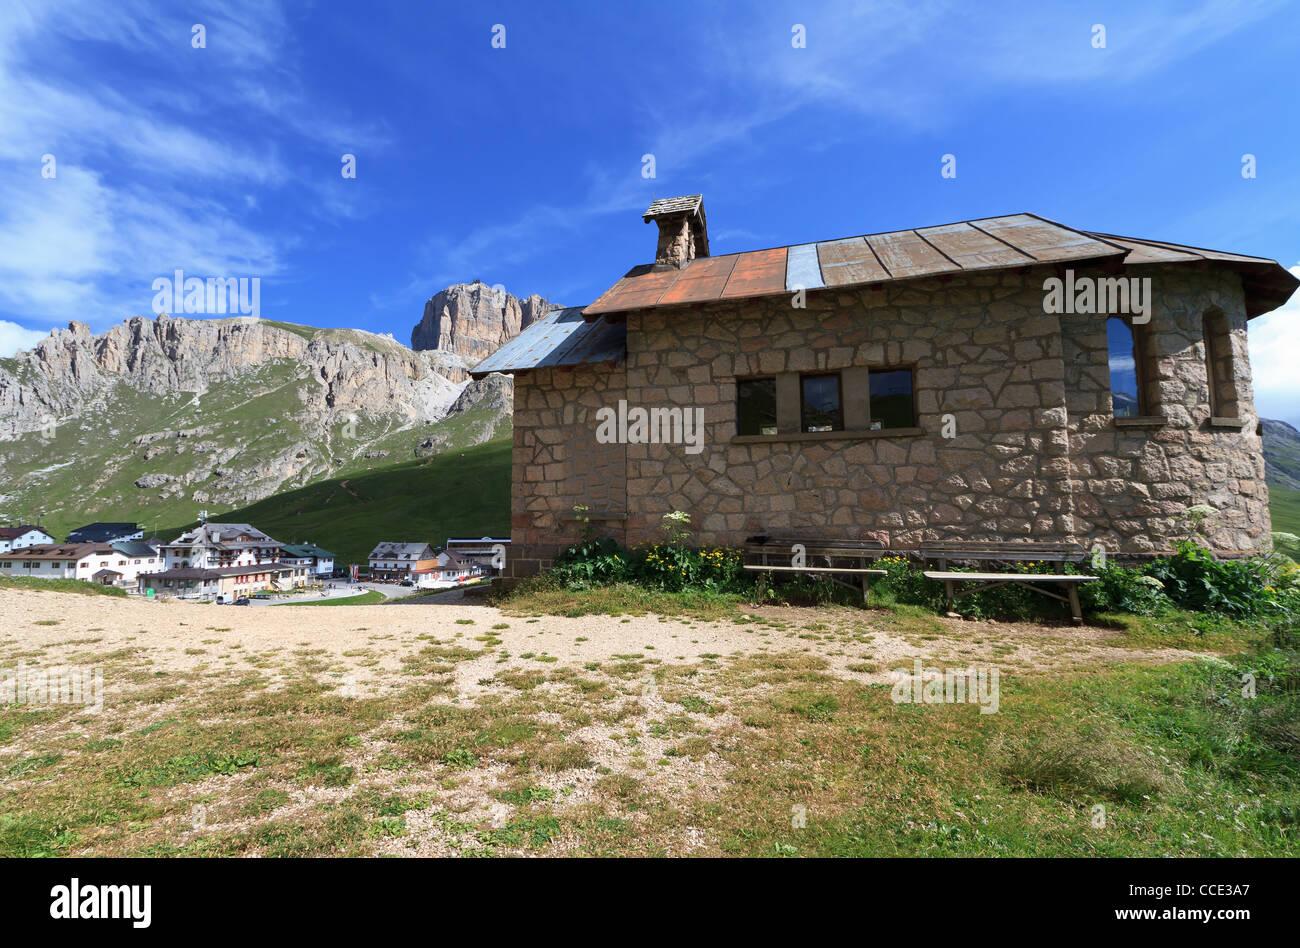 chapel in Pordoi pass between Arabba and Canazei, Italian Dolomites - Stock Image